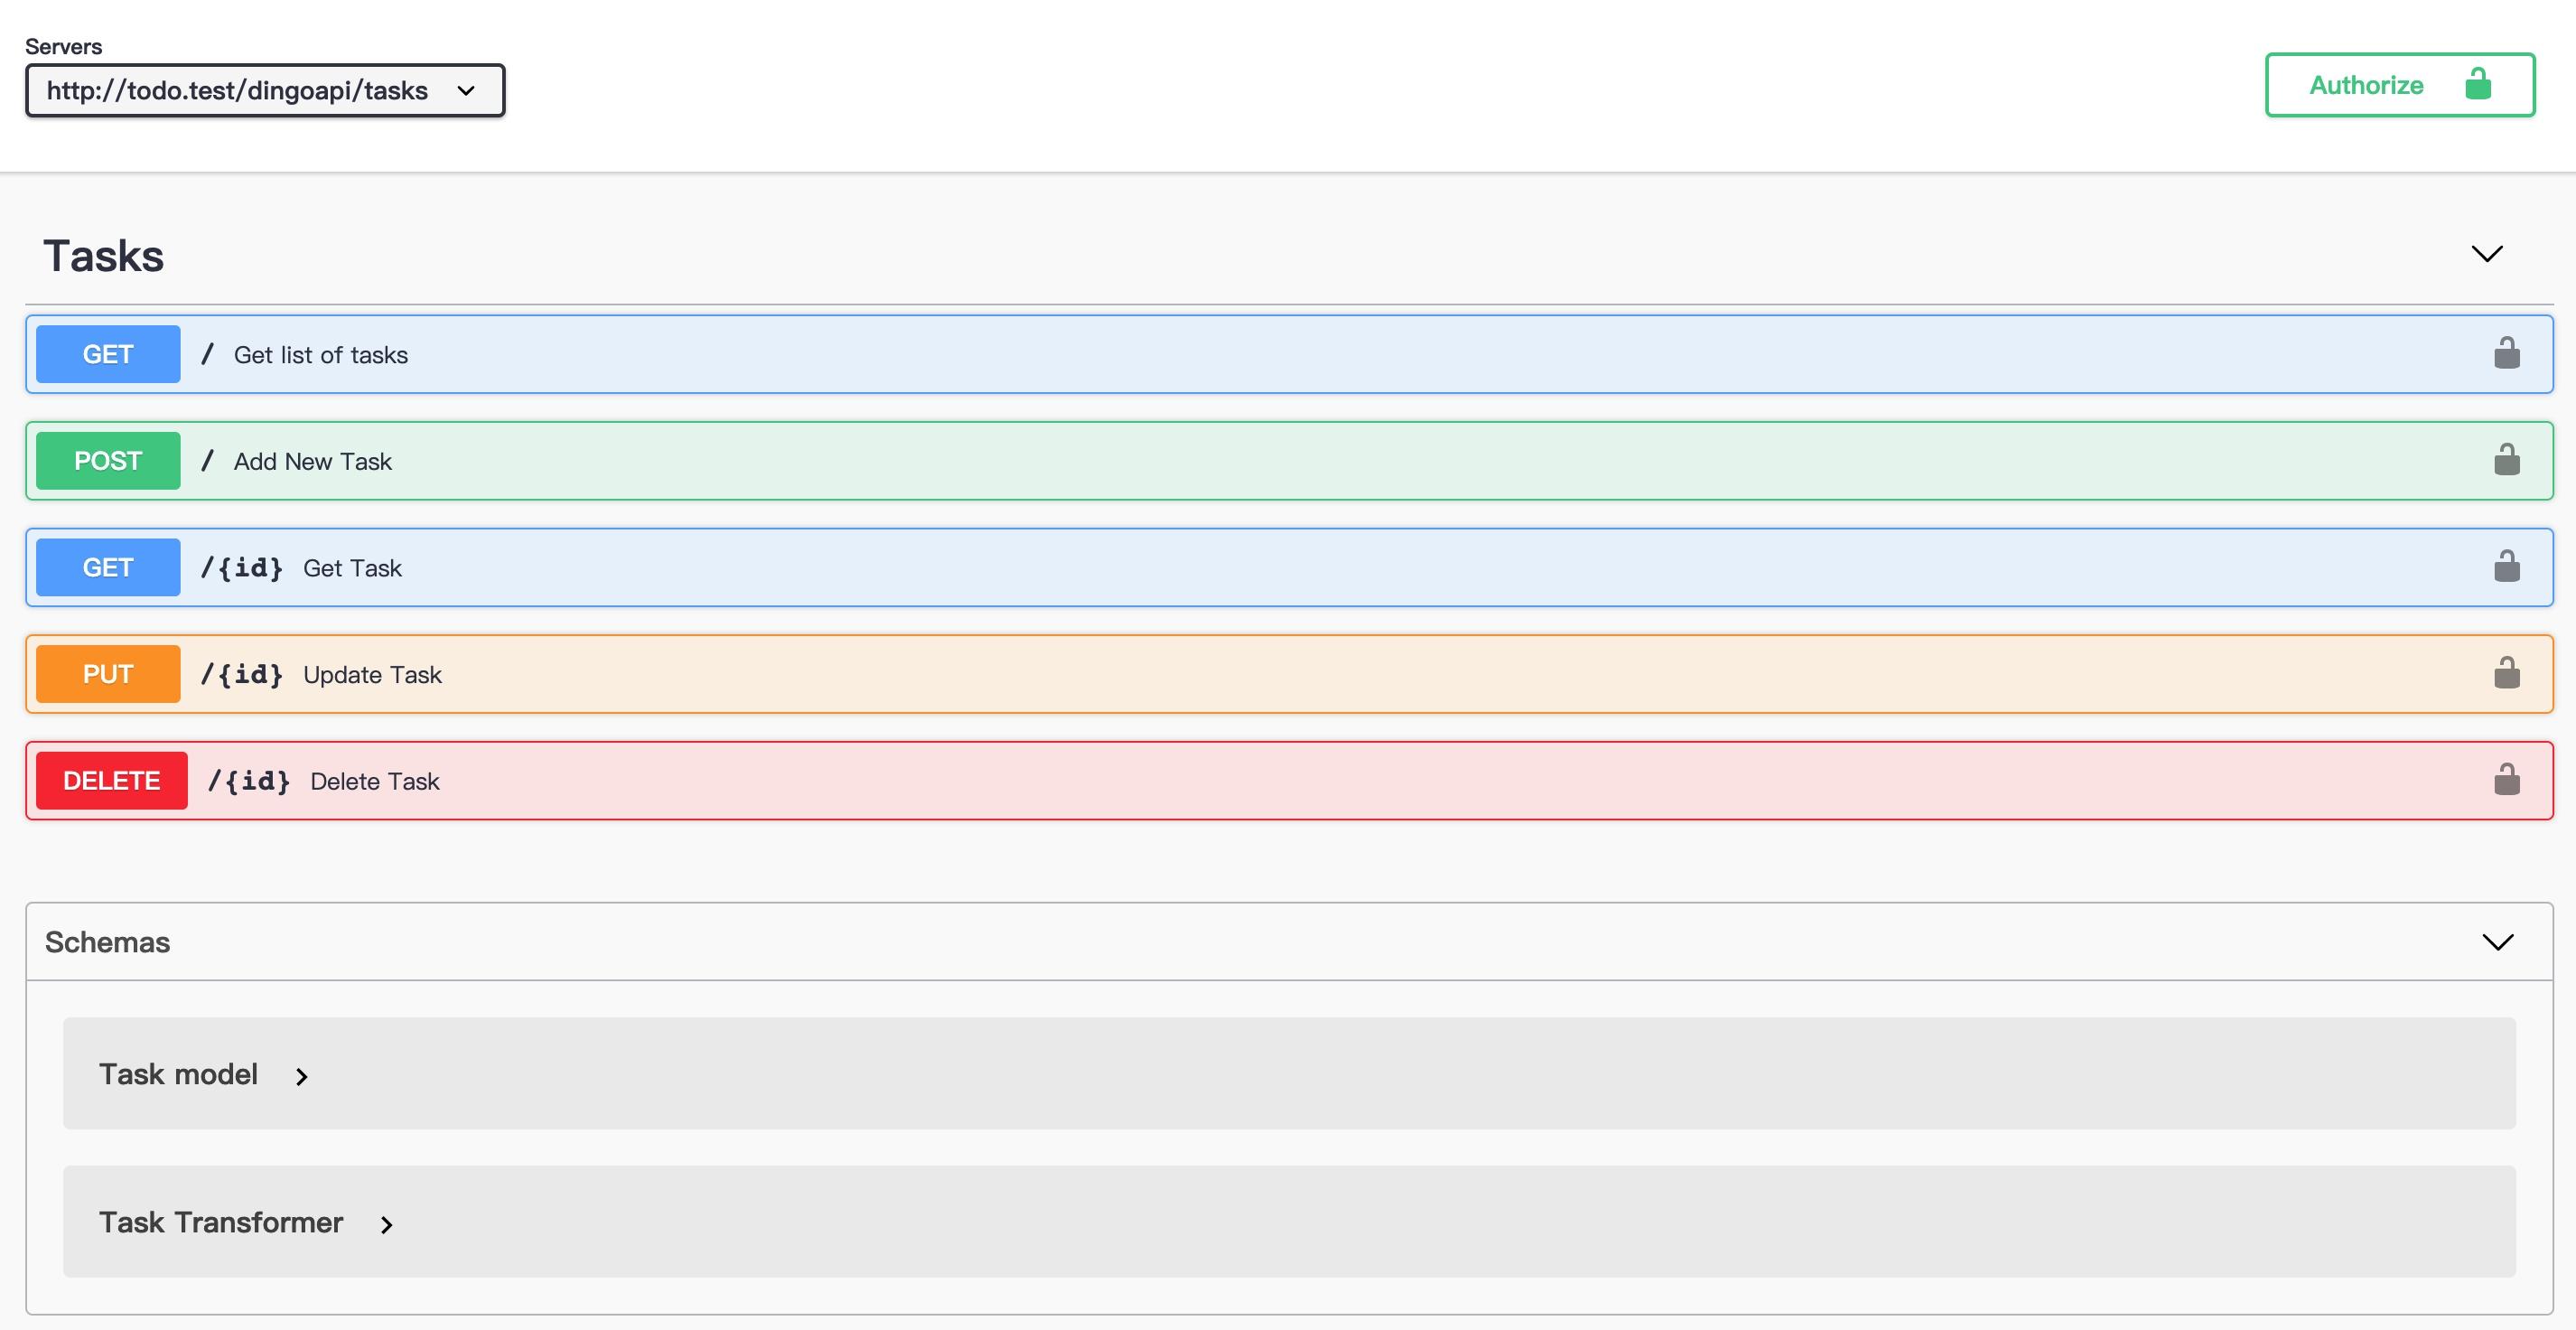 Laravel+Swagger 为资源路由生成 API 文档